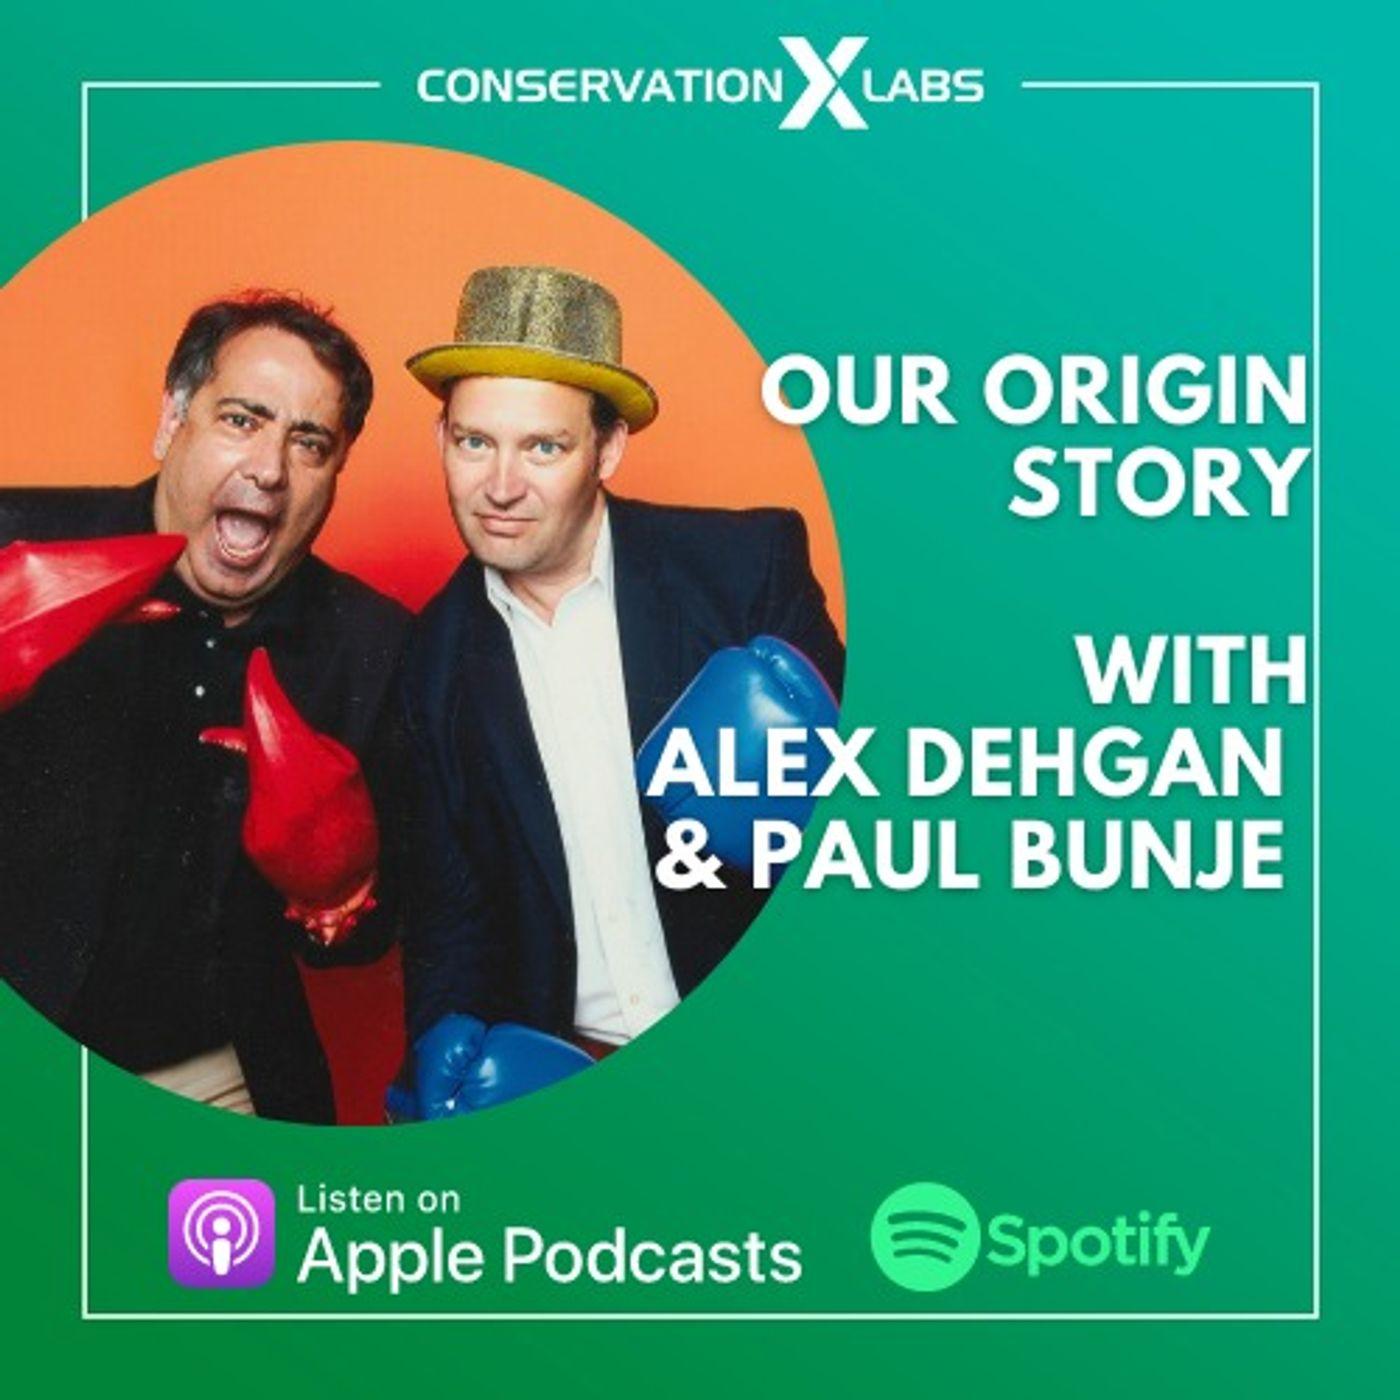 Our Origin Story with Alex Dehgan and Paul Bunje